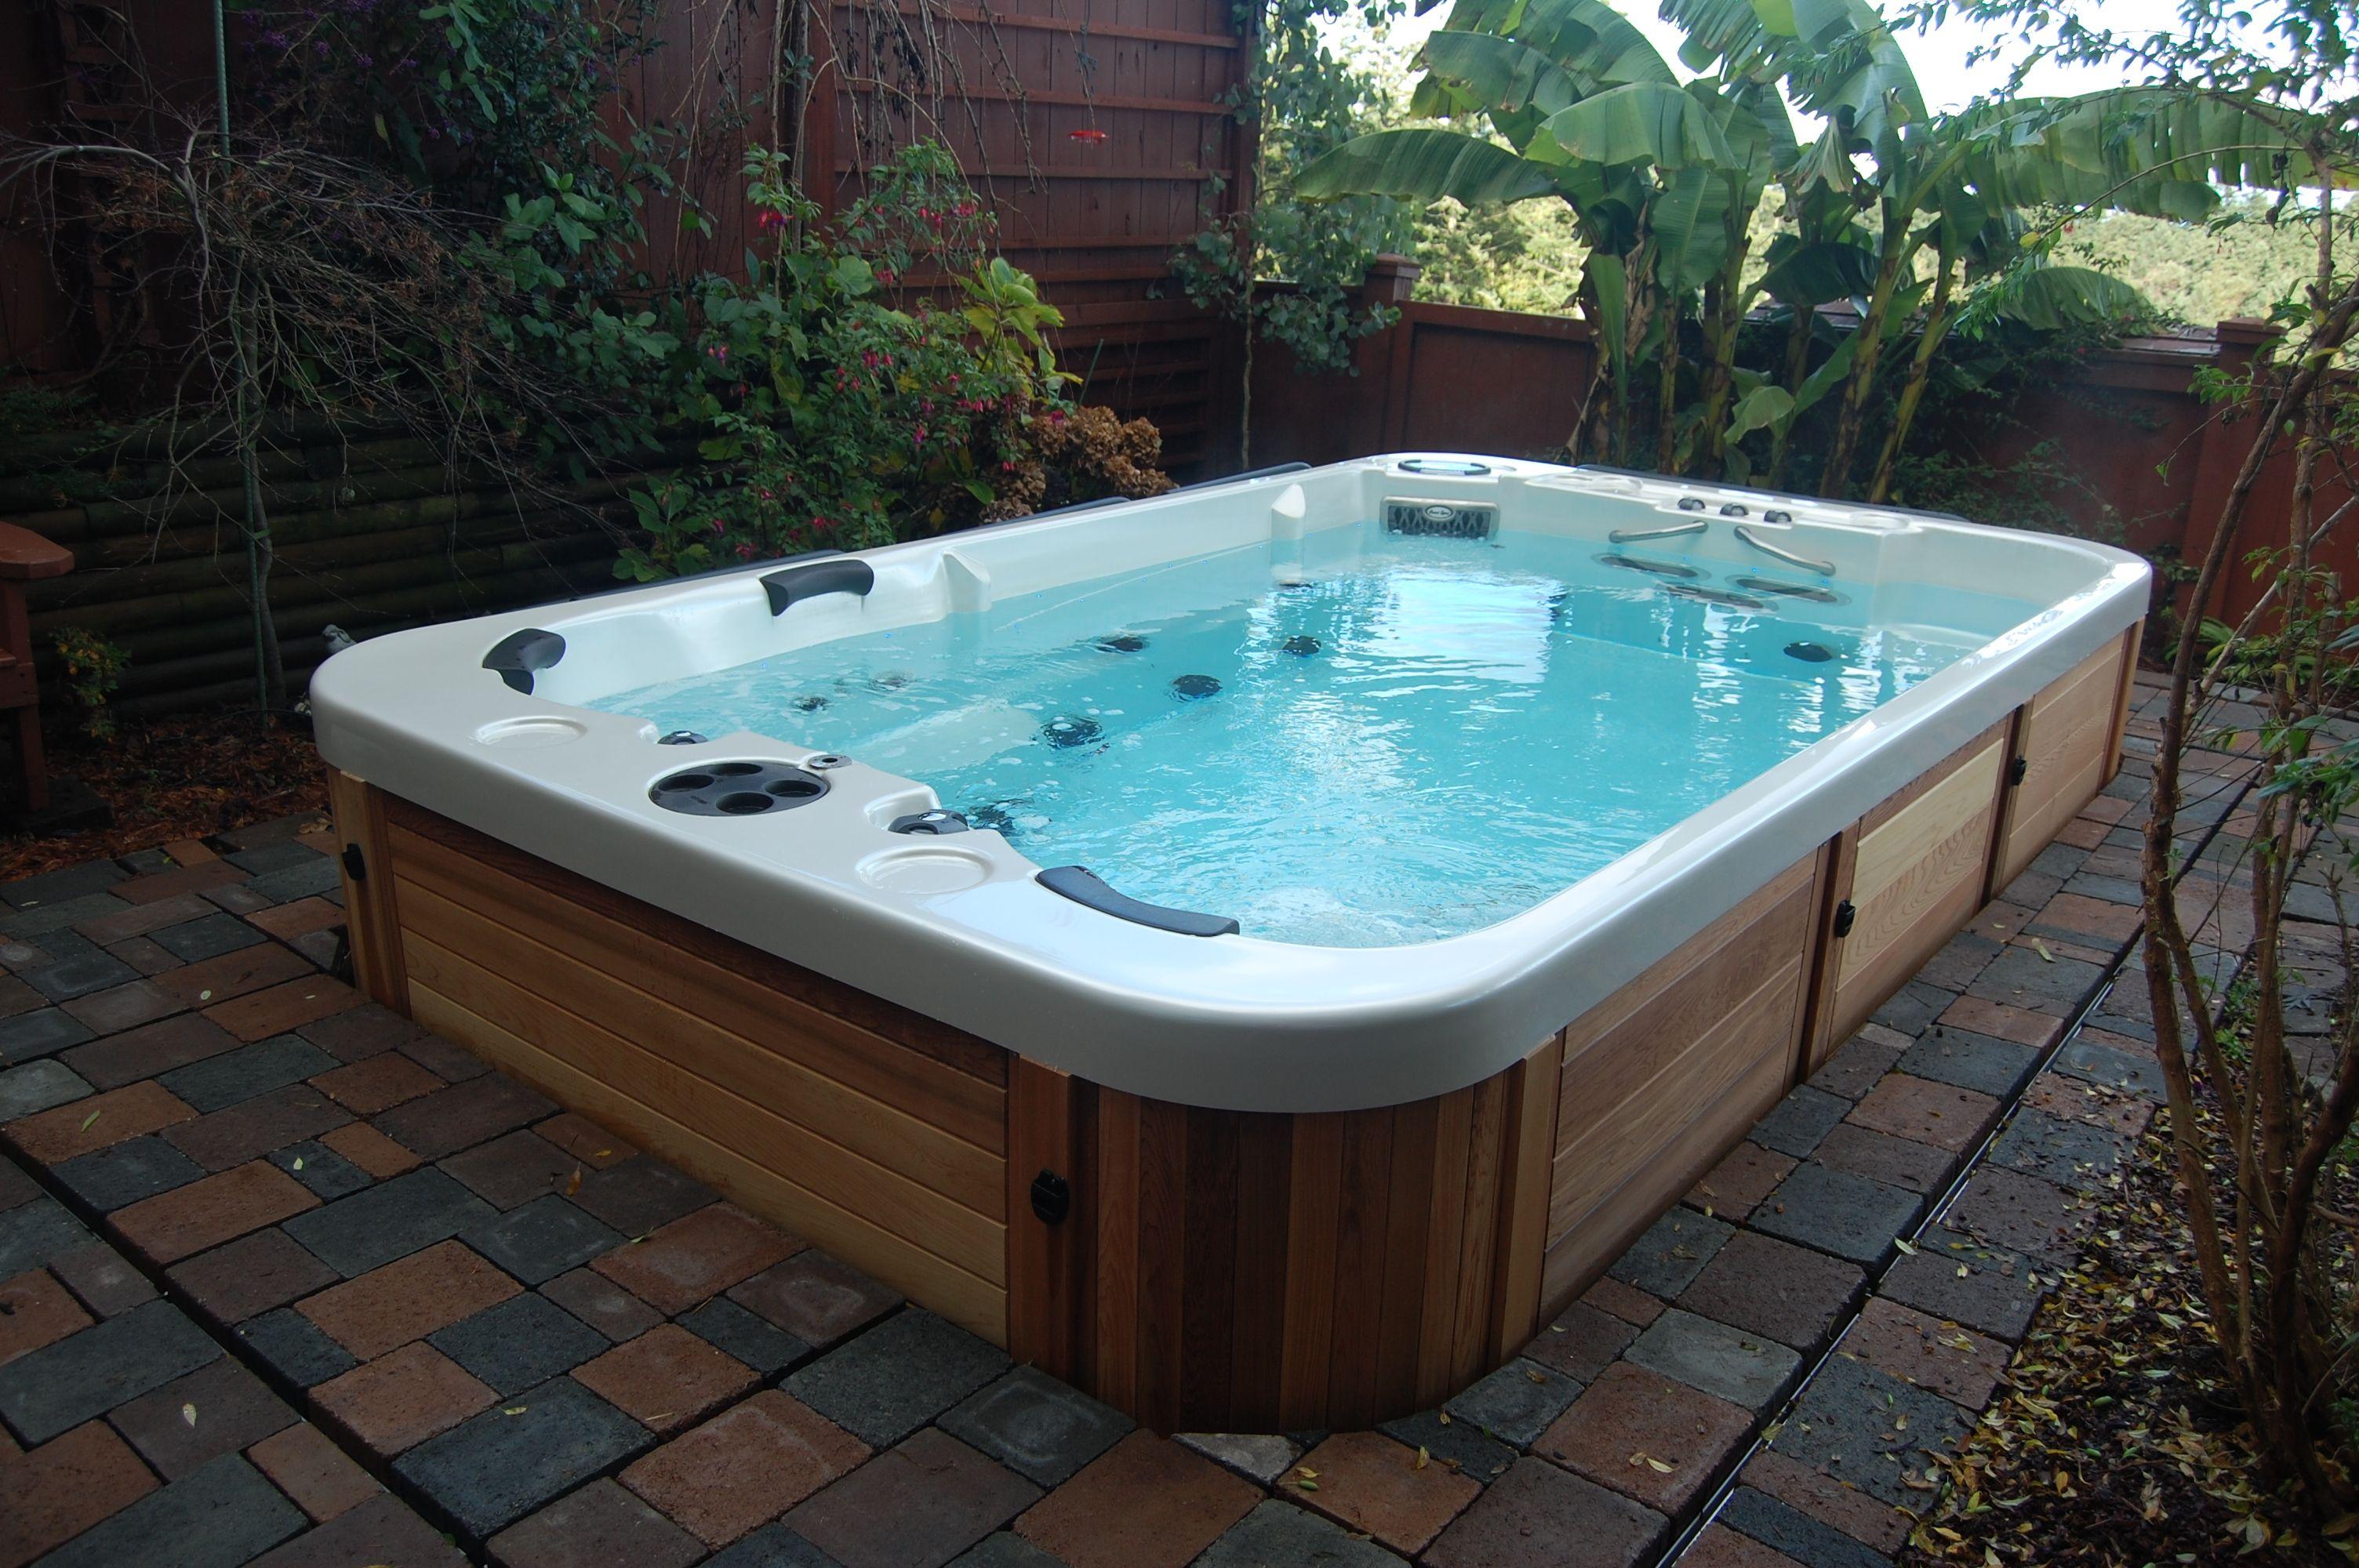 d0c681065a6 An Introduction to Swim Spas - International Pool   Spa